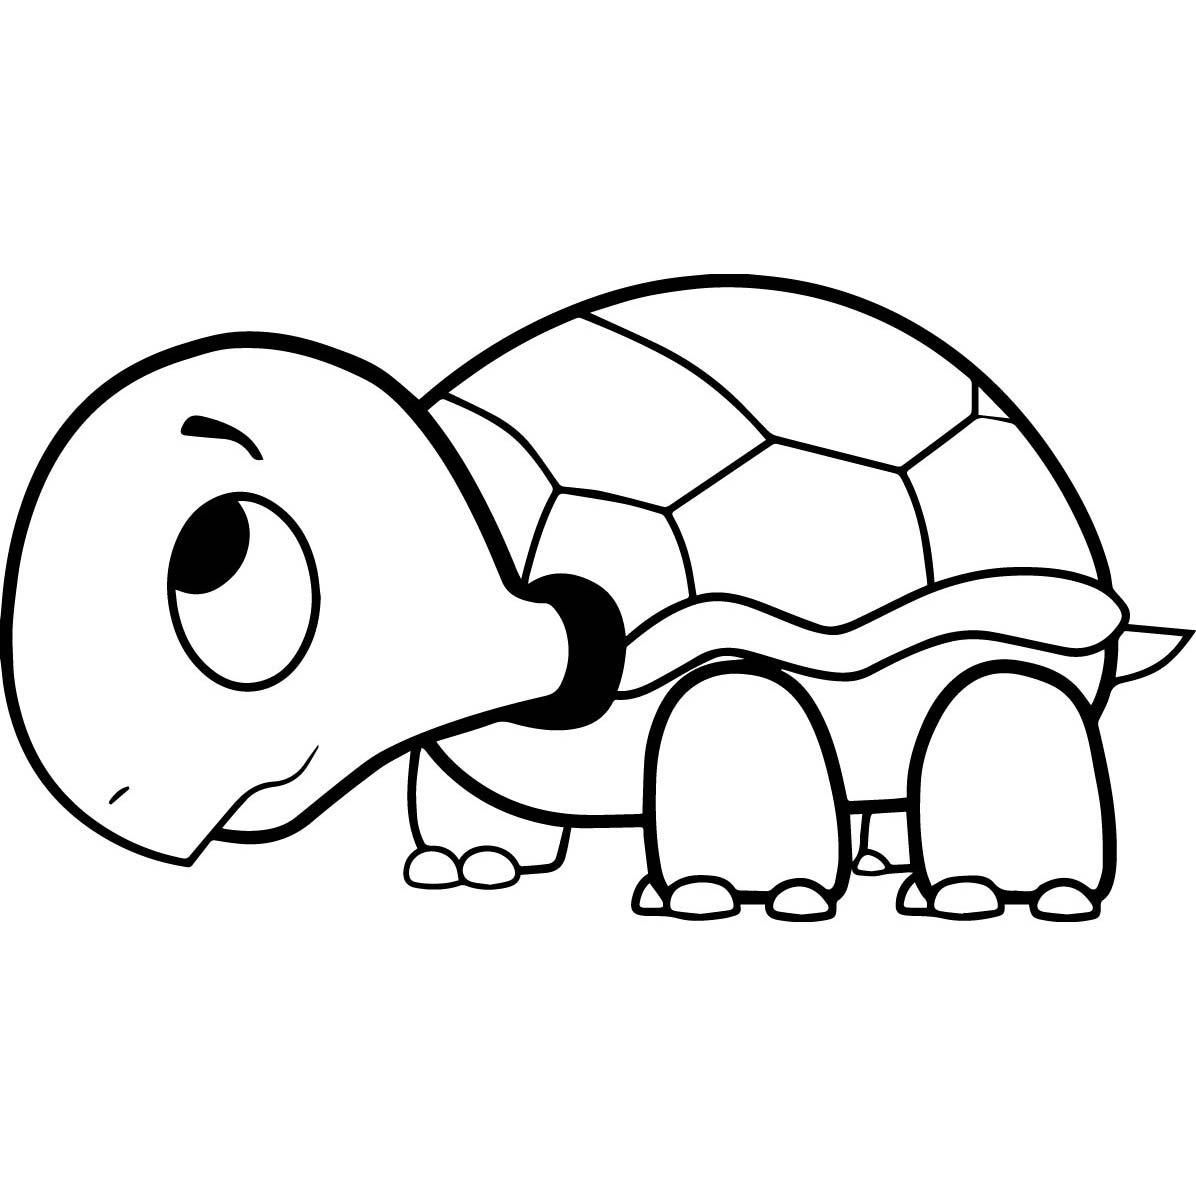 Desenho De Tartaruga Triste Para Colorir